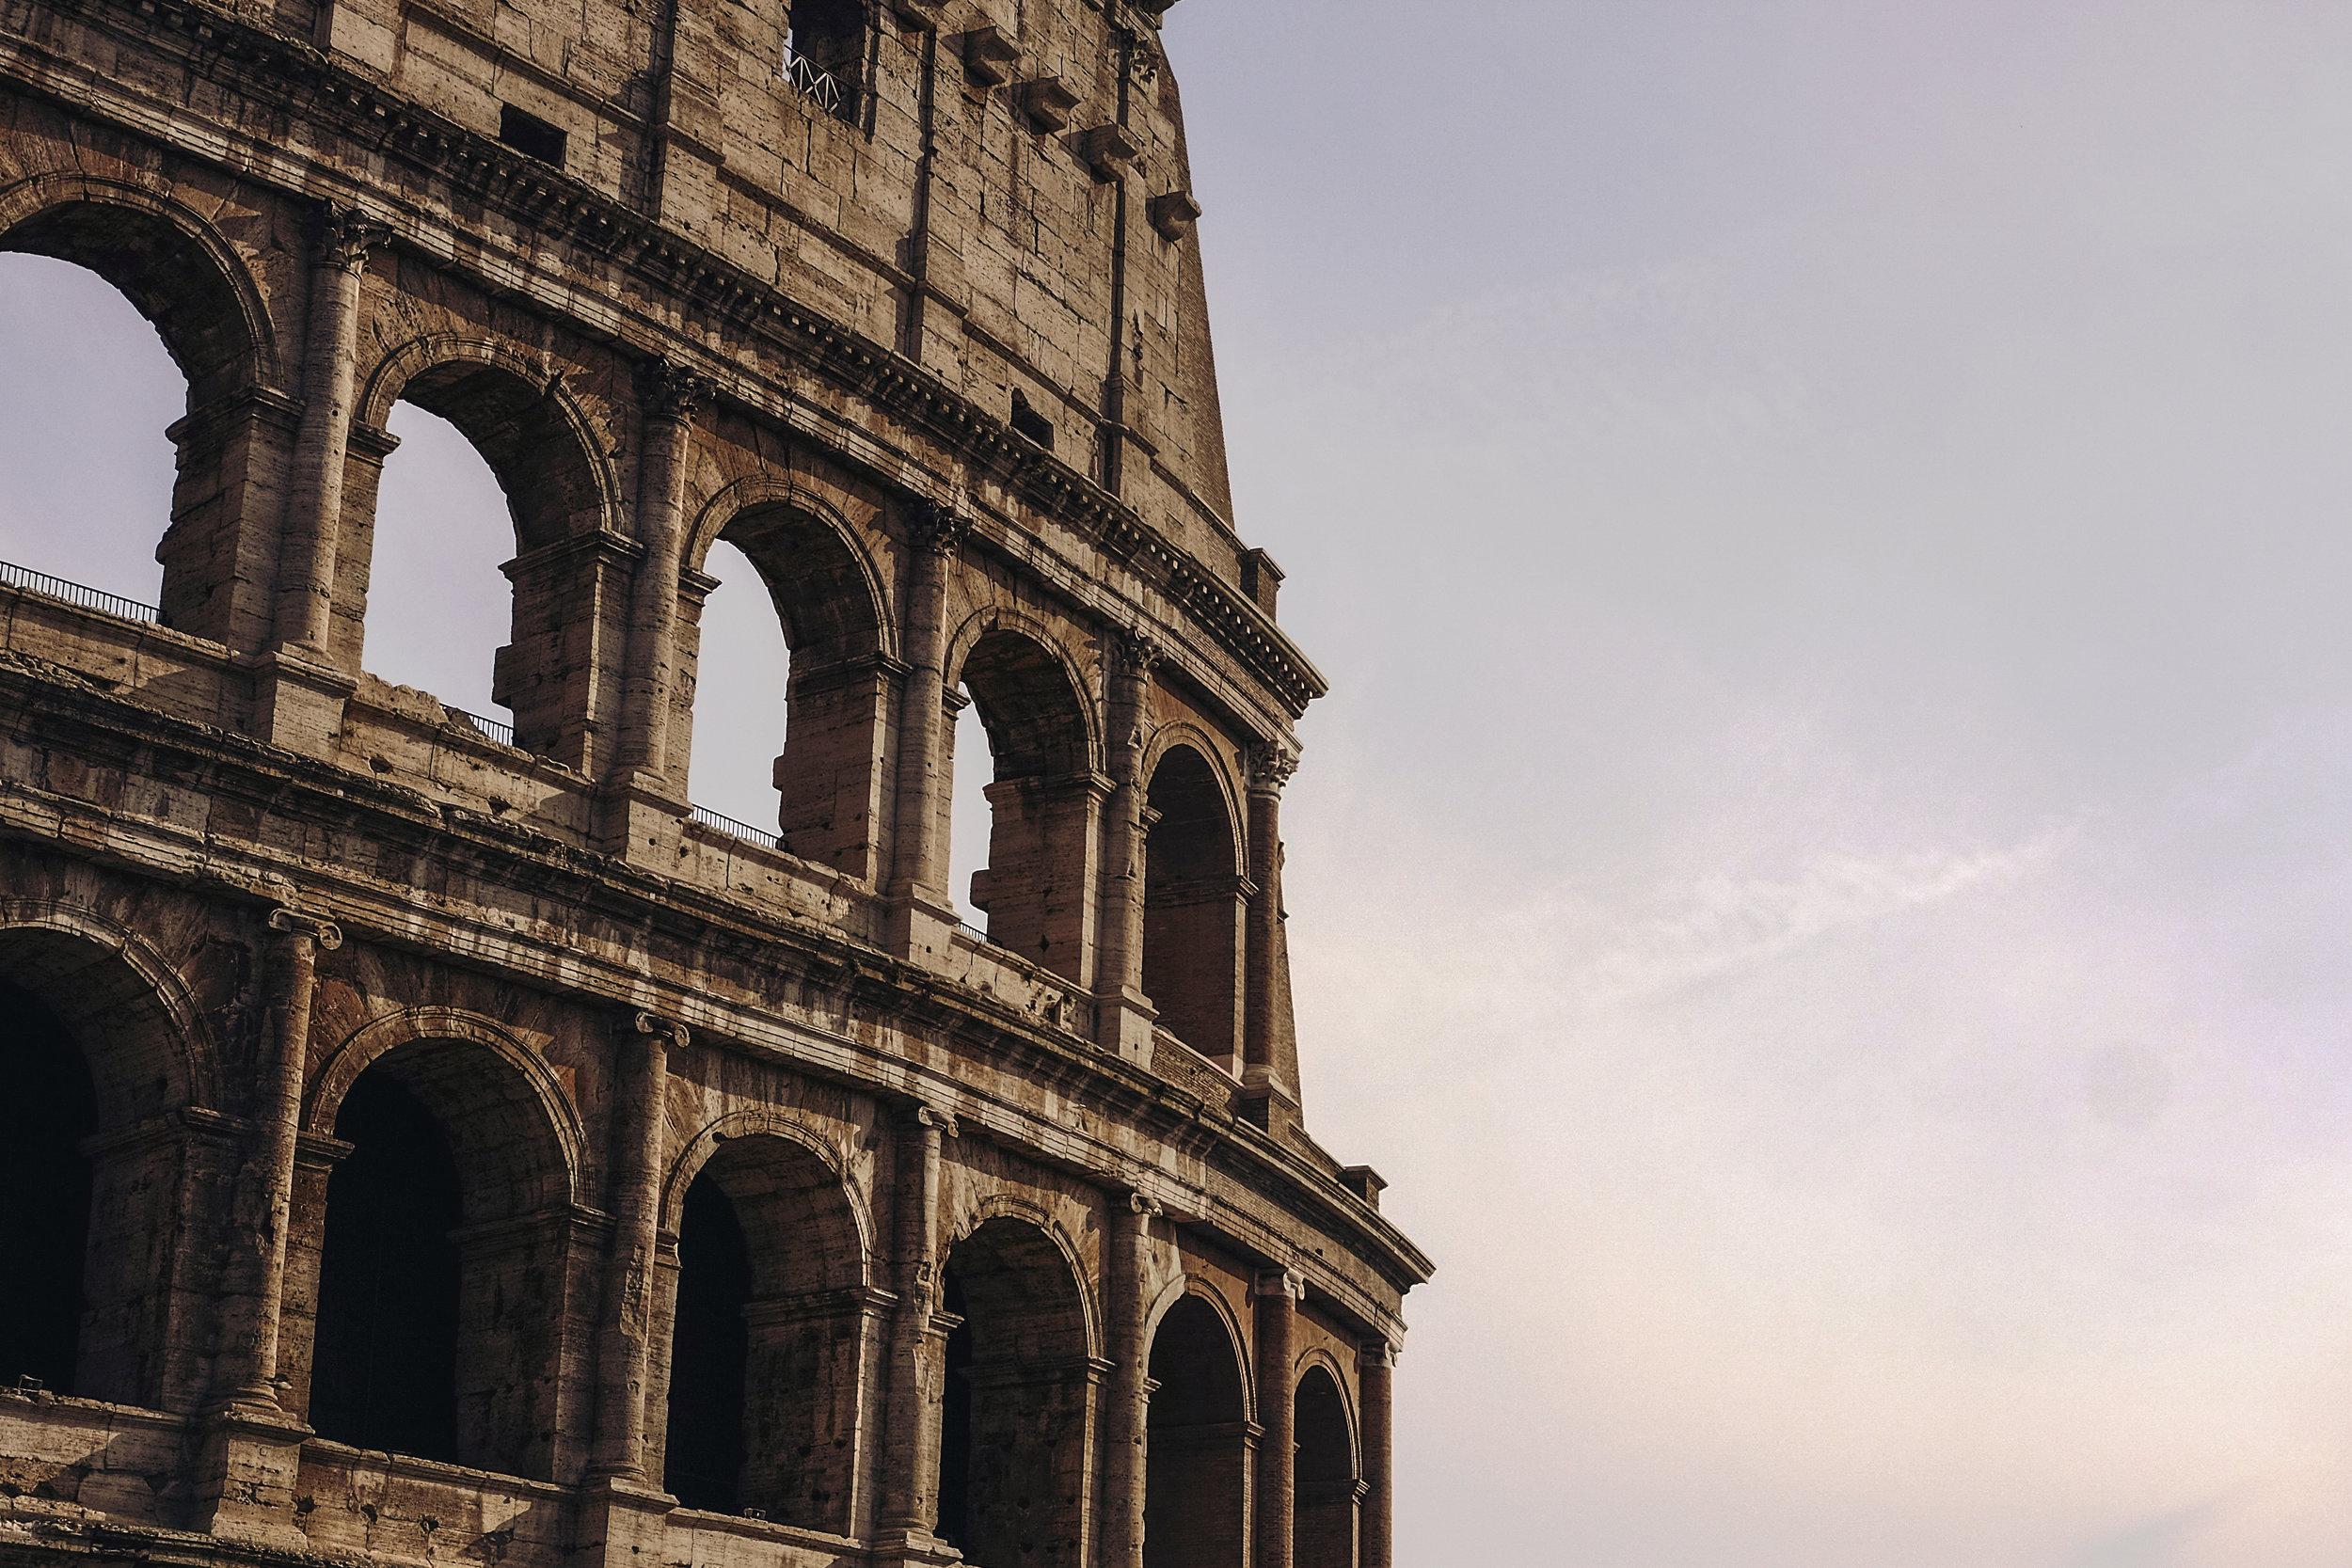 ROMA - Via Antonio Salandra, 1800187 RomaItaly+39 (0) 064-227-2173